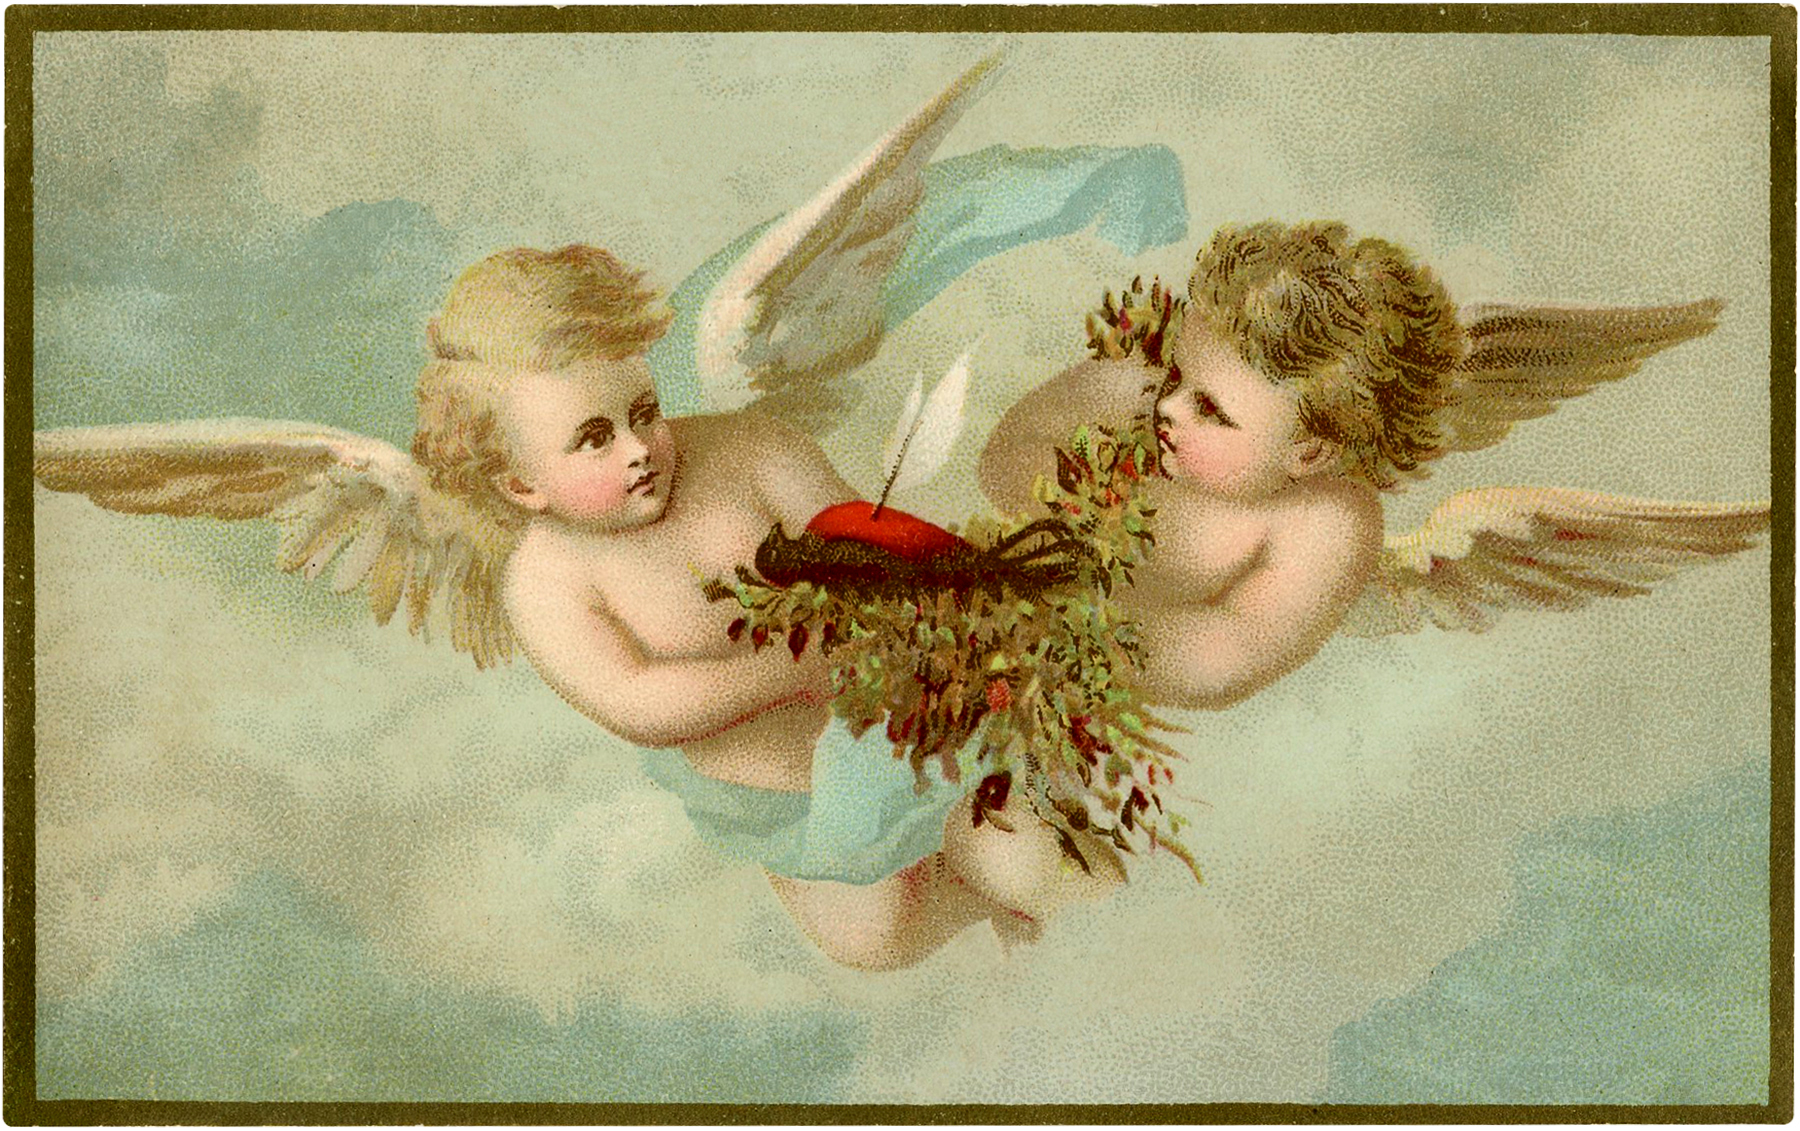 Vintage Cherubs with Robin Image